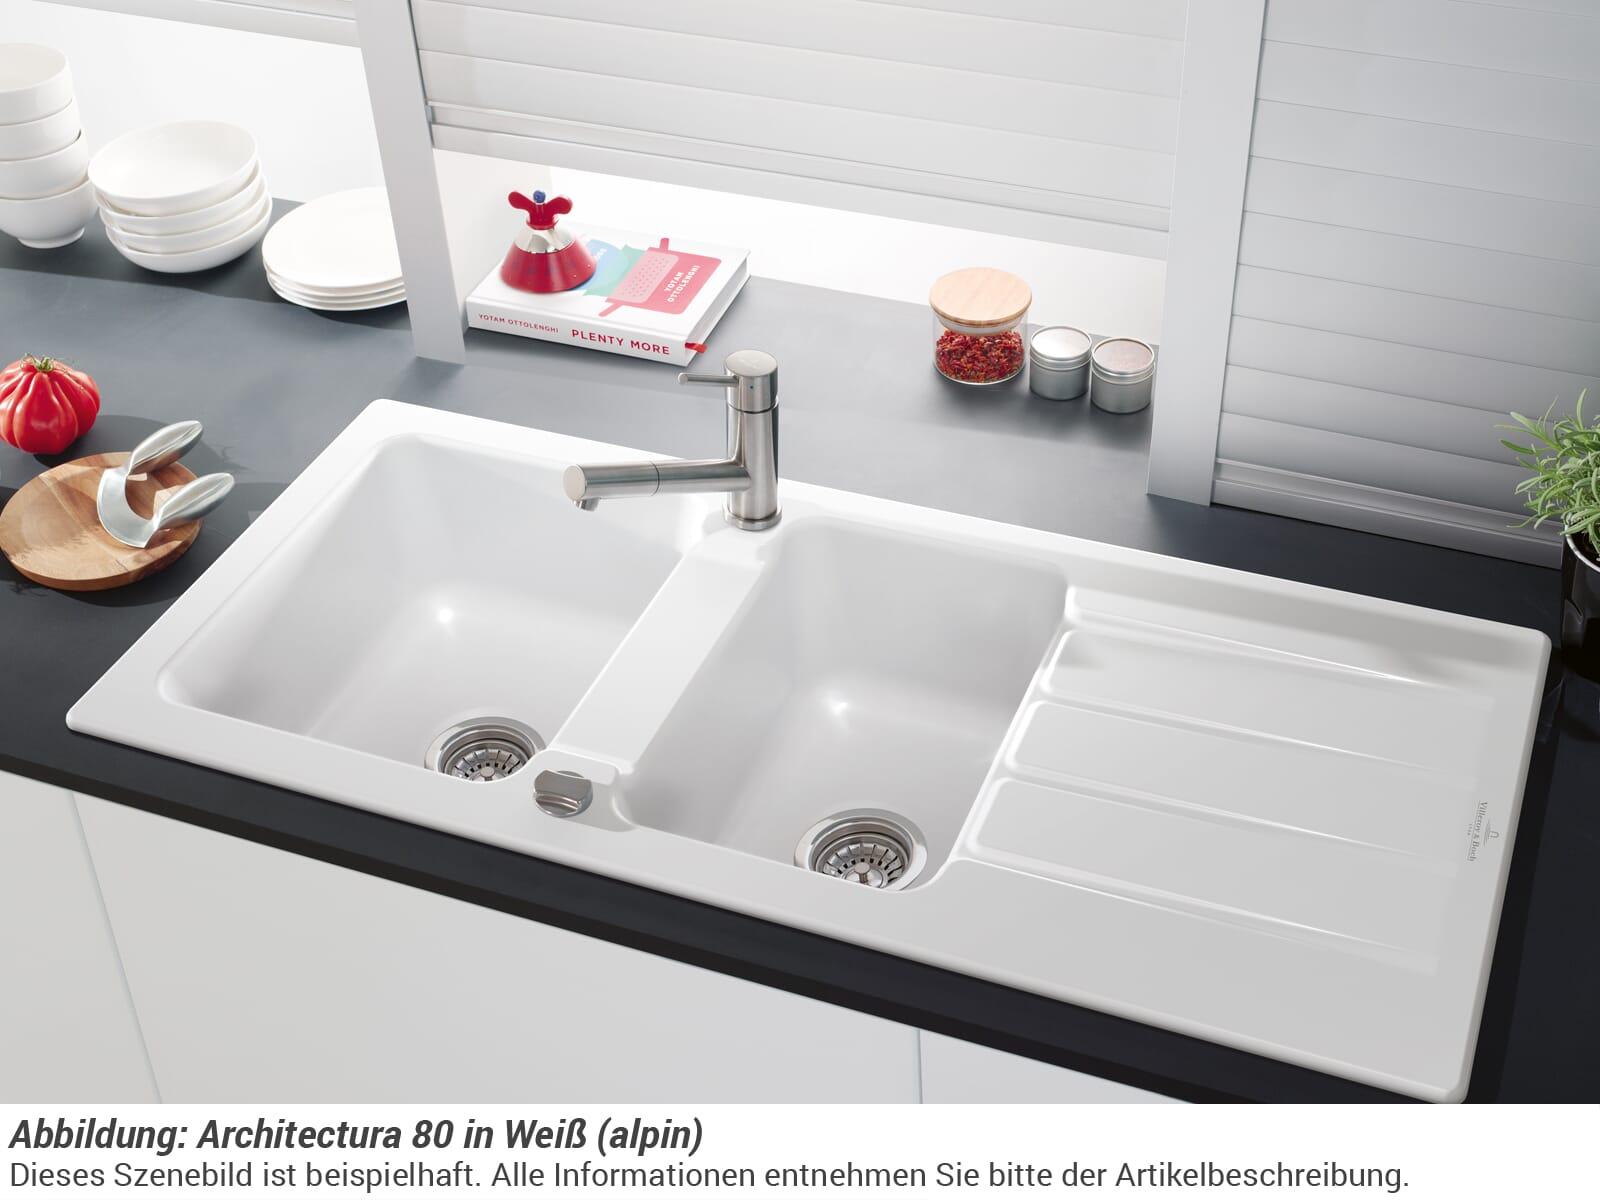 Villeroy & Boch Architectura 80 3380 02 AM Almond Keramikspüle Exzenterbetätigung